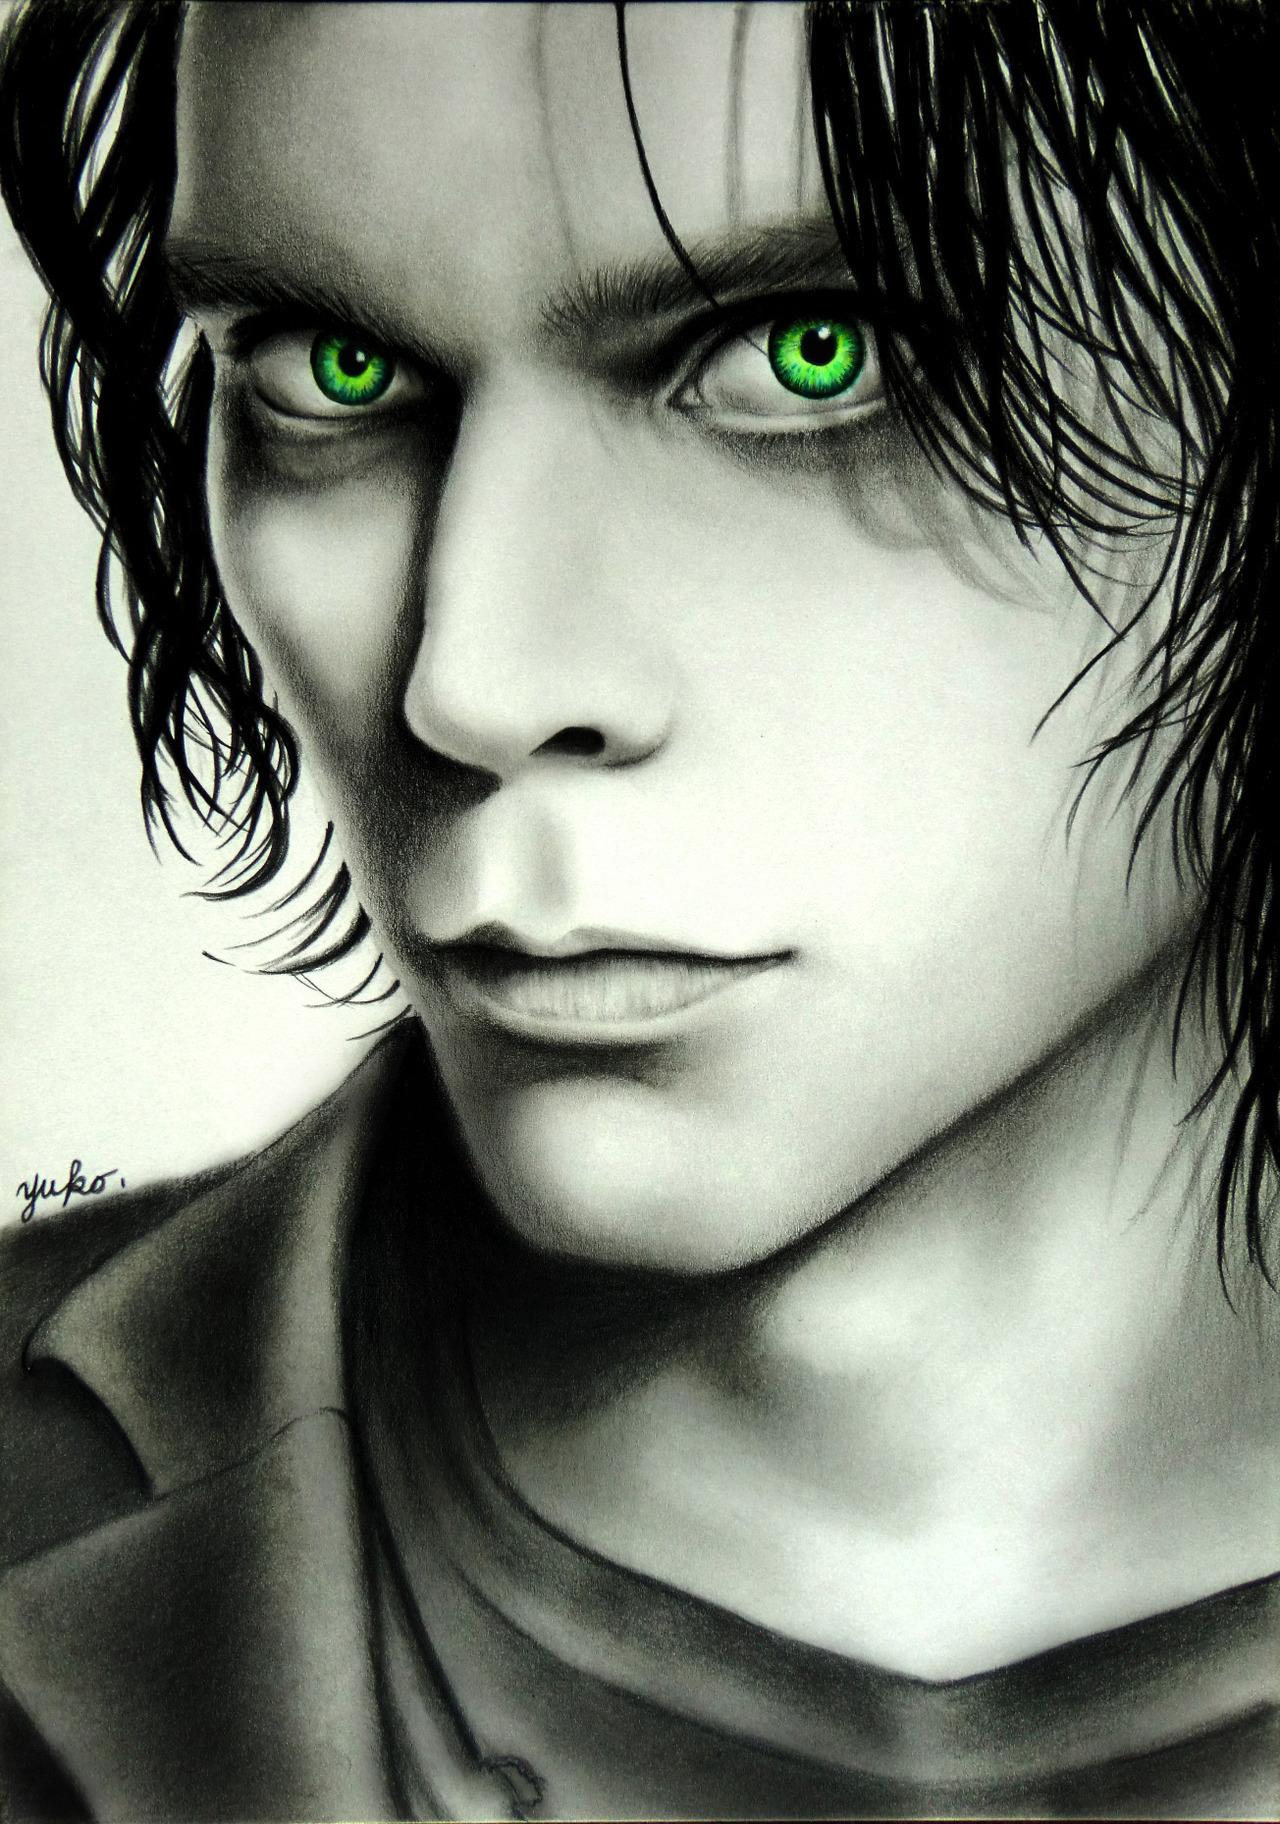 """Ojos verdes son traidores, azules son mentireiros...  marrones y acastañados son firmes y verdadeiros..."" - Página 4 Tumblr_m9efhgl6lm1r0sazzo1_1280"